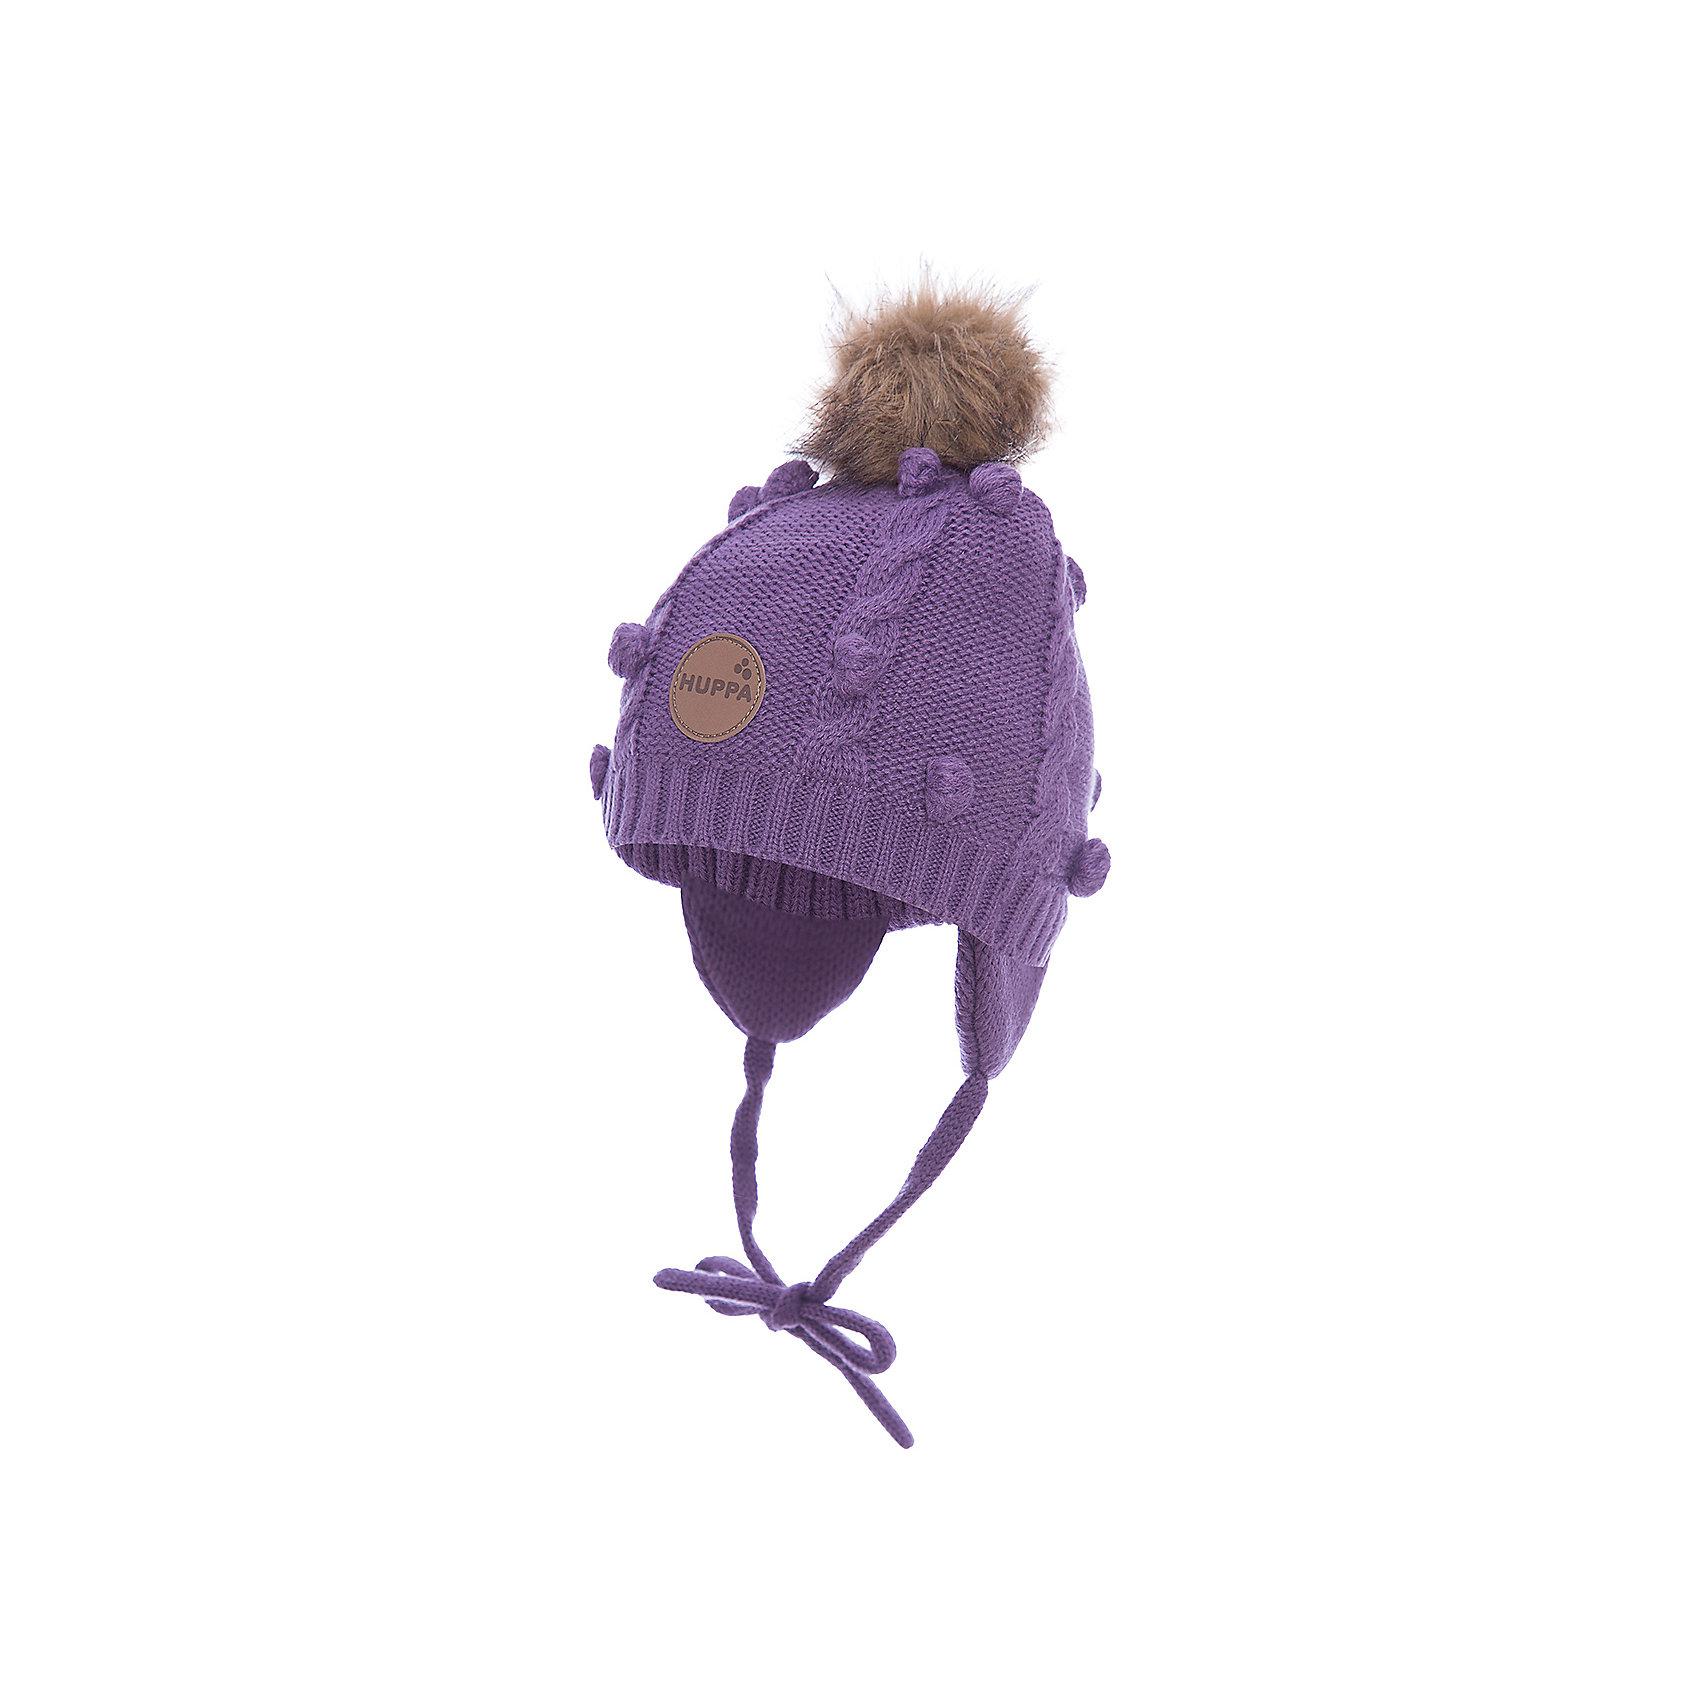 Huppa Шапка для девочки Huppa шапка детская huppa шапка зимняя weemi фиолетовый принт